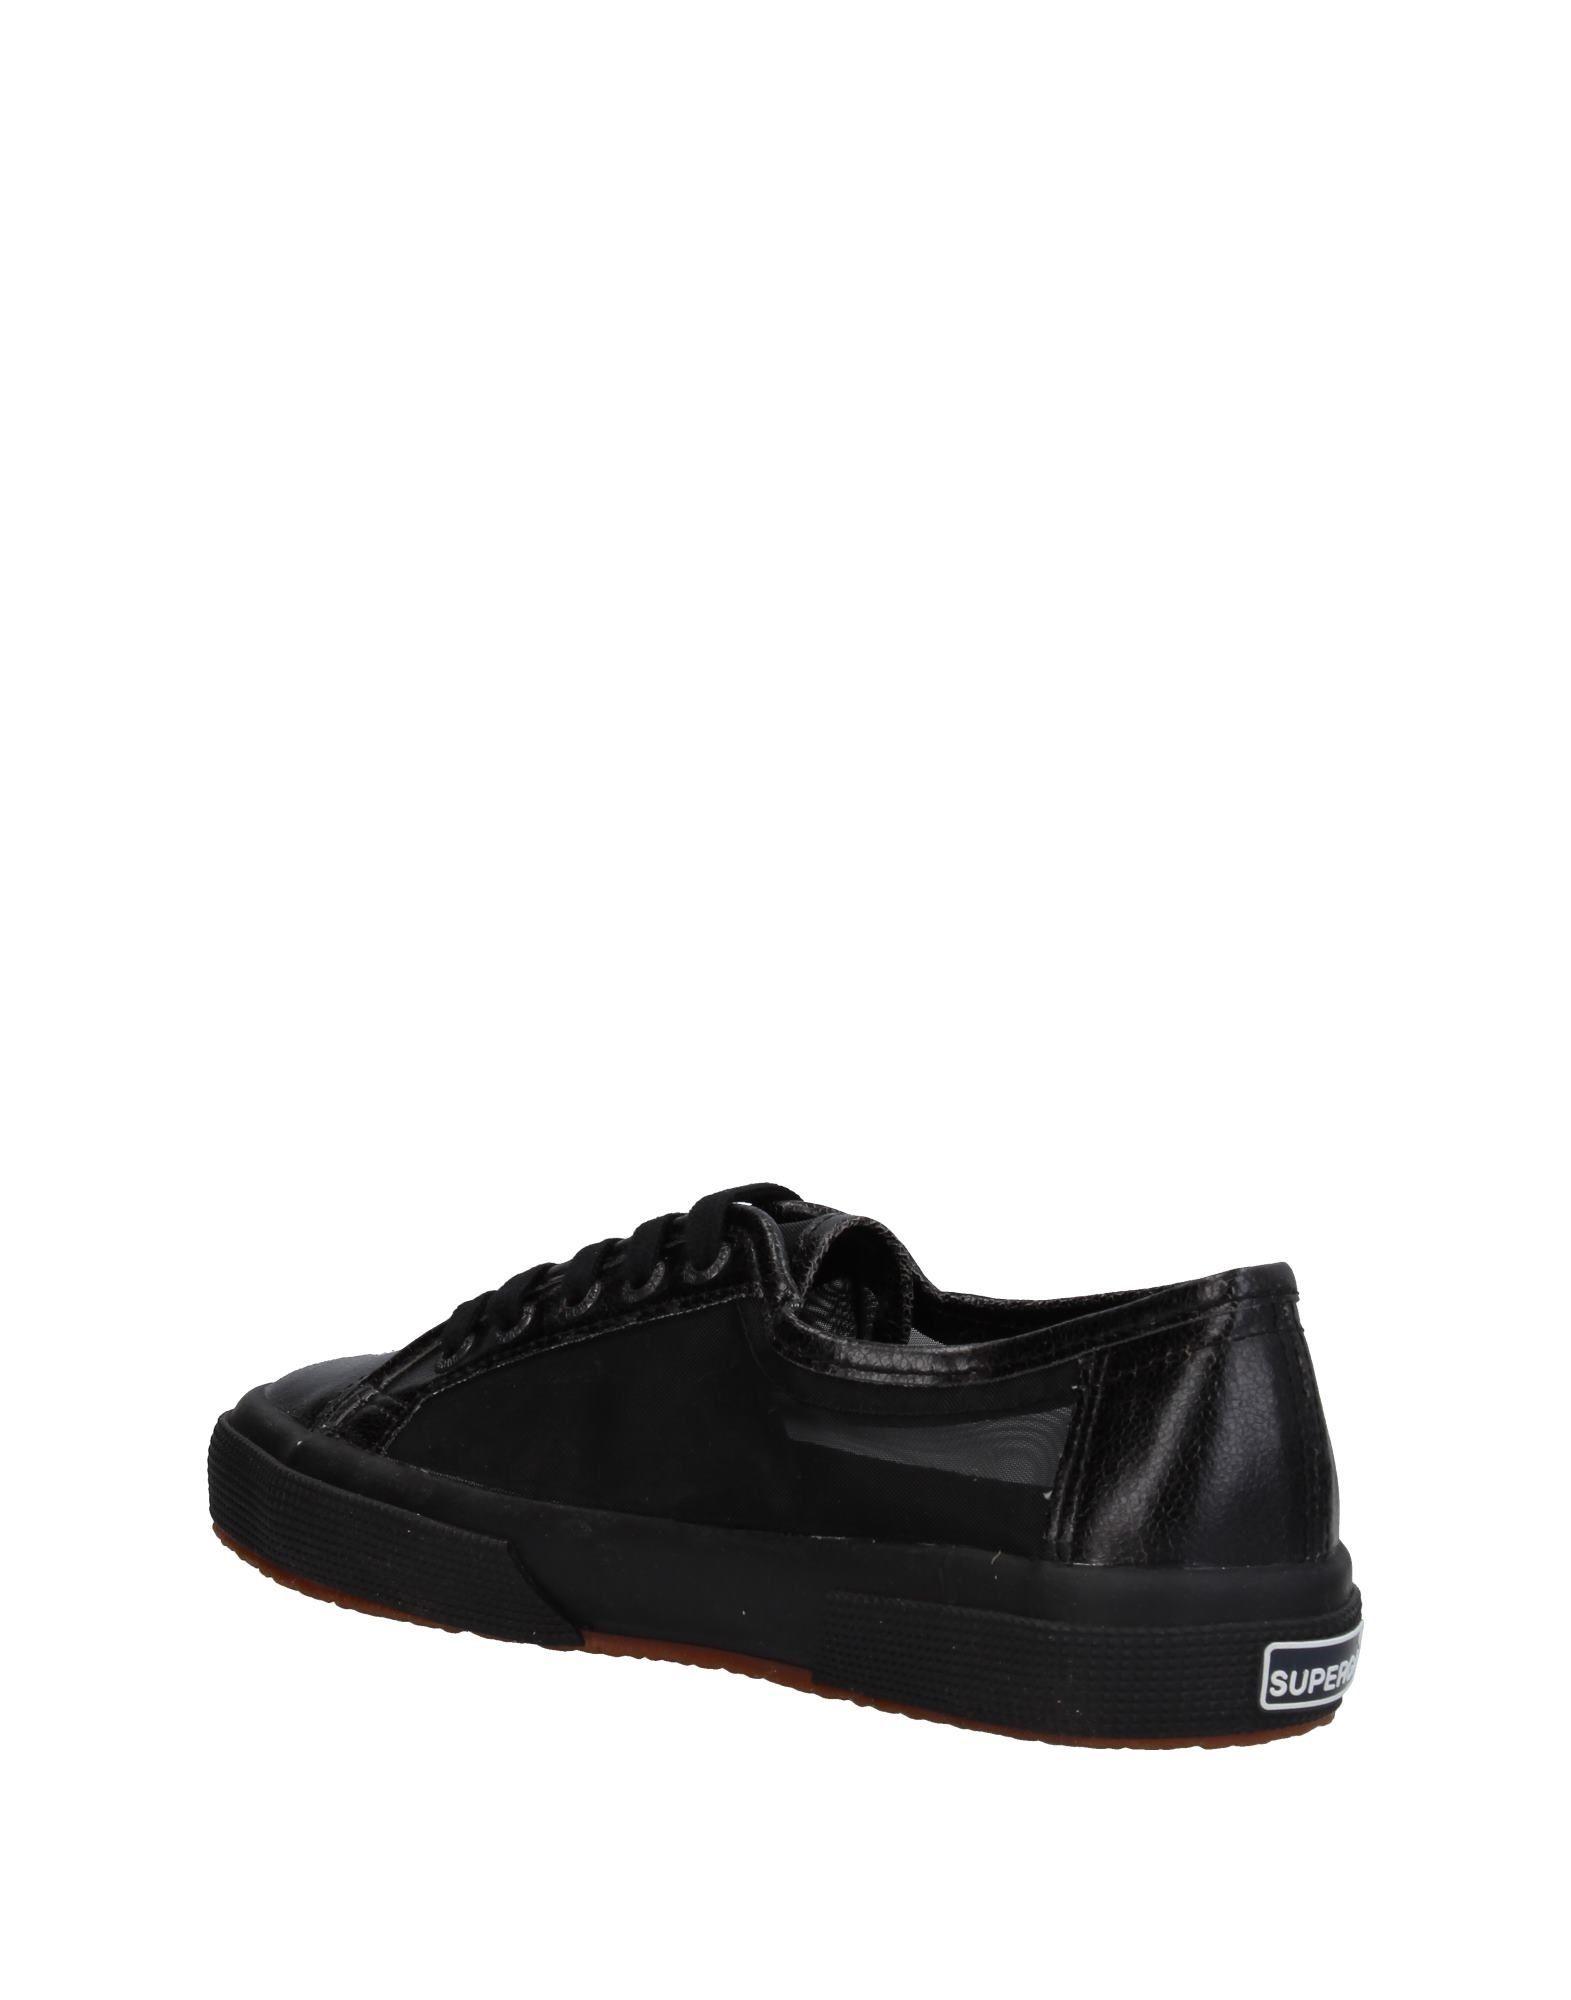 Superga Black Coated Fabric Sneakers